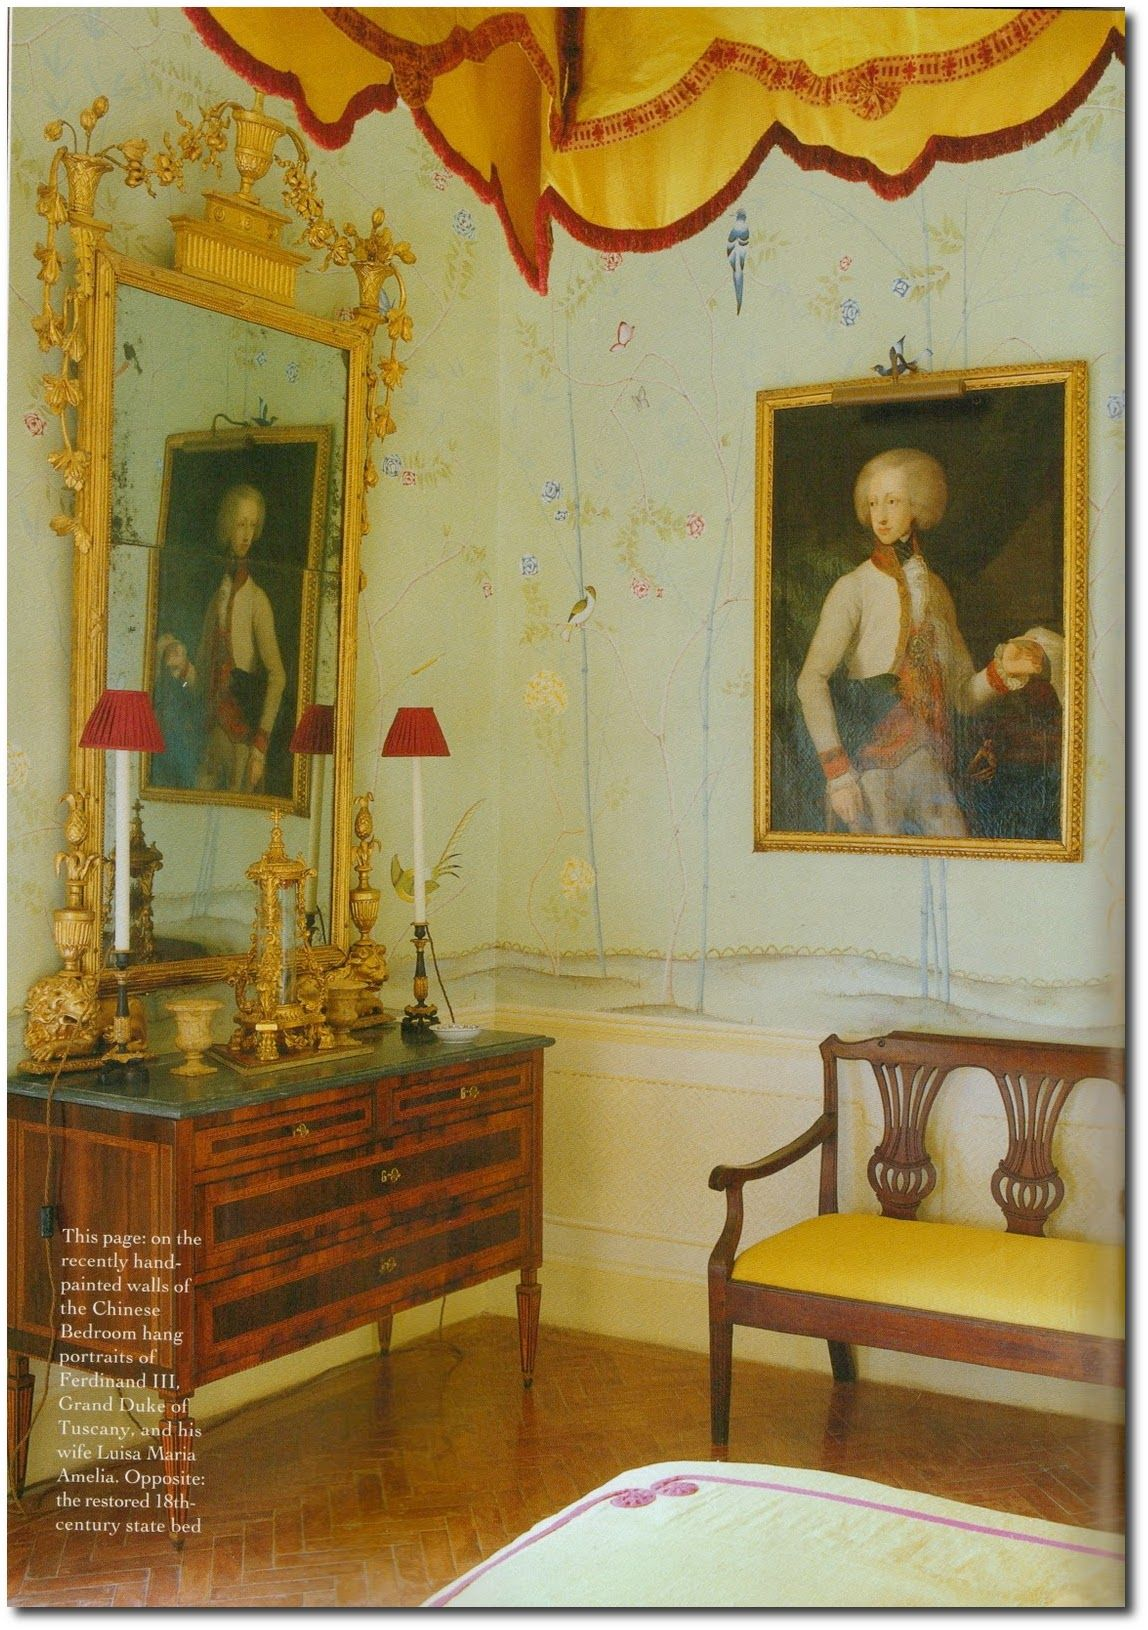 Hylton Nels Home, World-Of-Interiors-Magazine